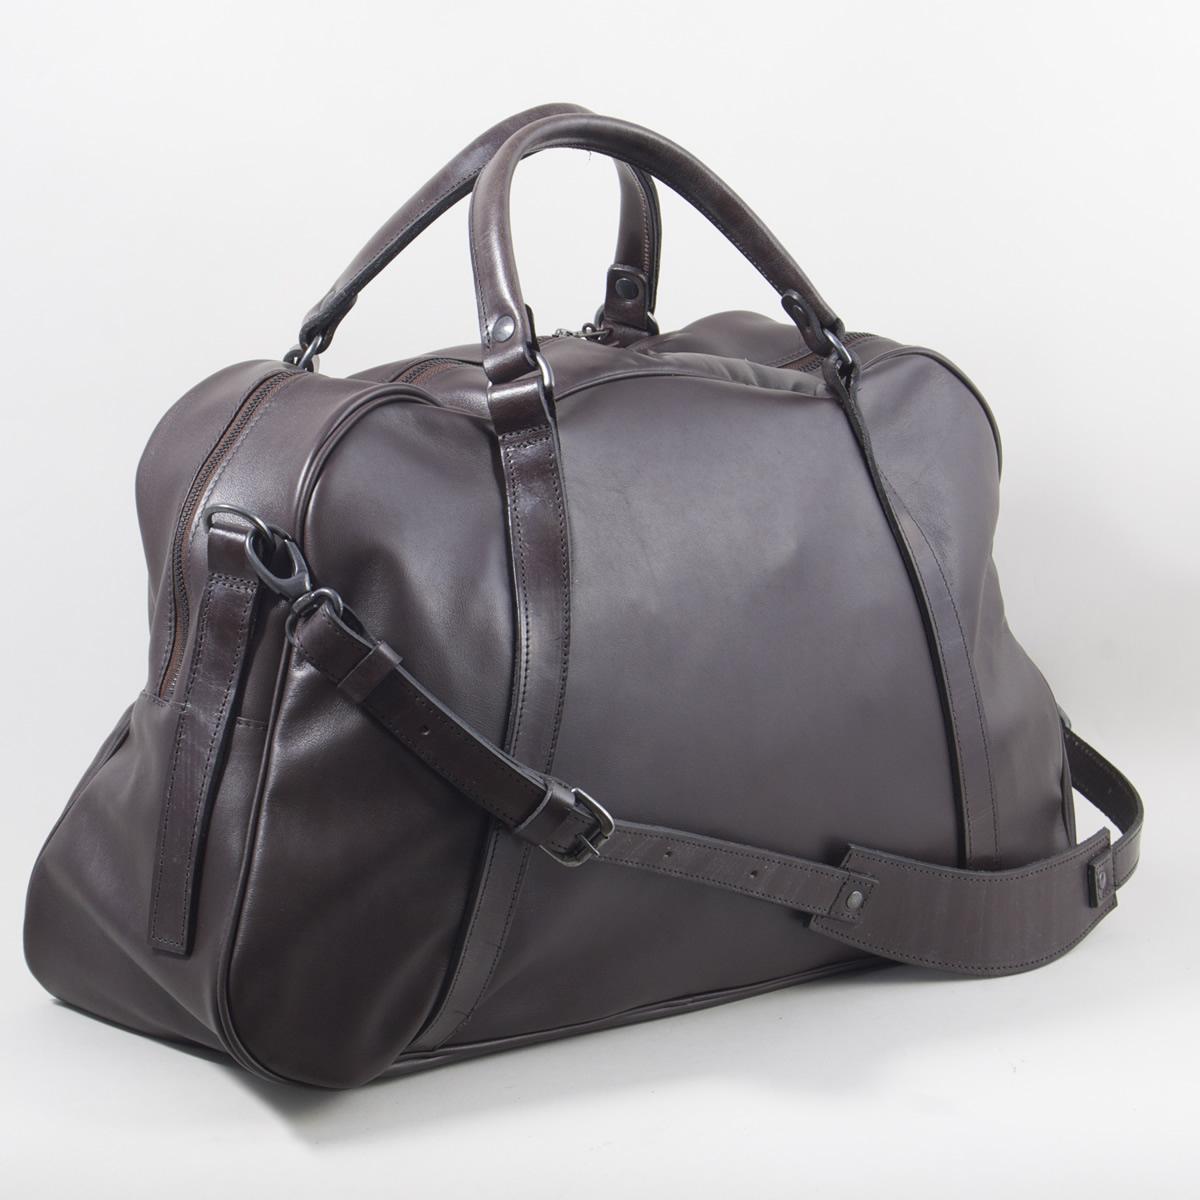 The Grip Bag